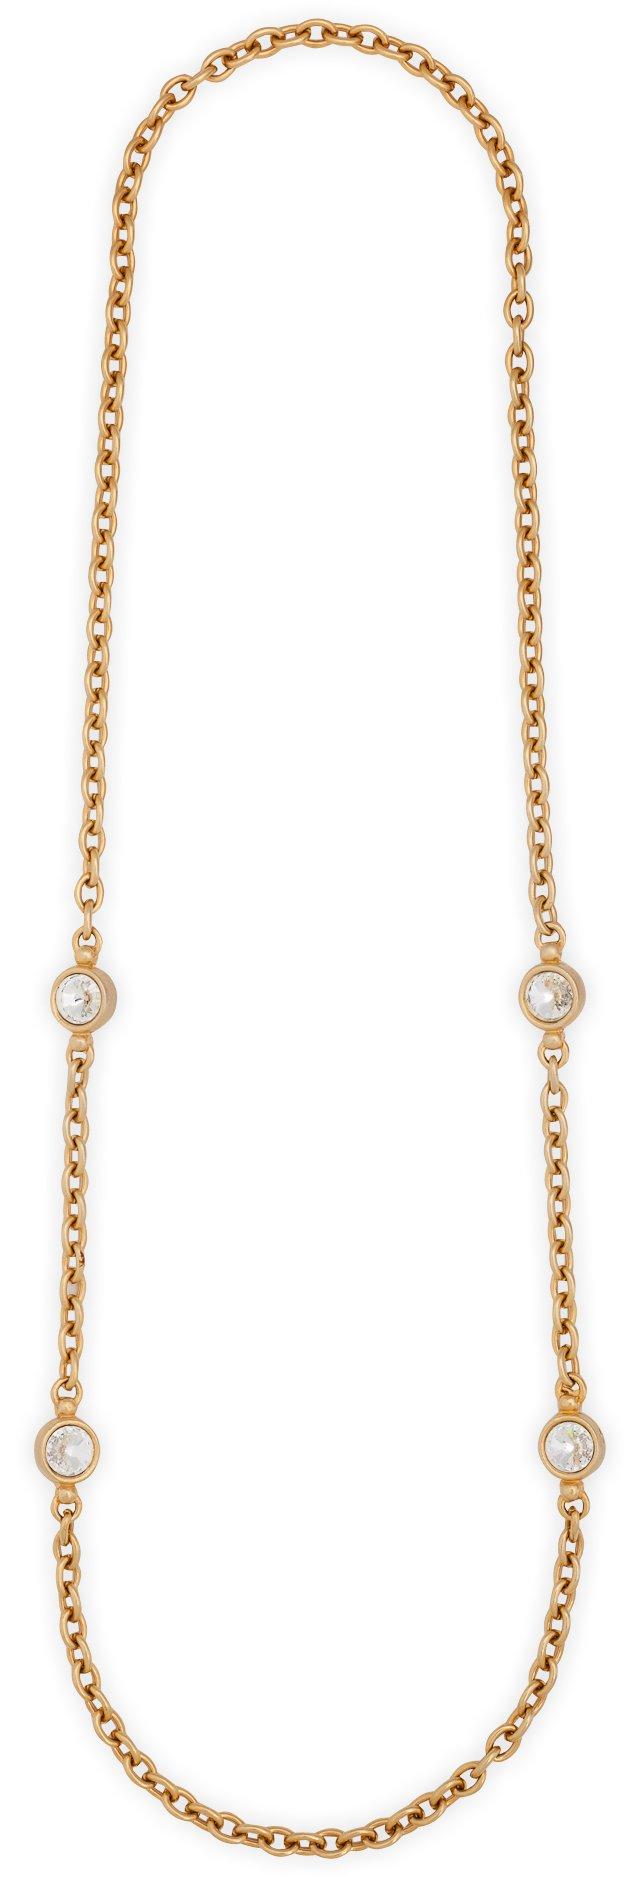 1980s Rhinestone Sautoir Necklace